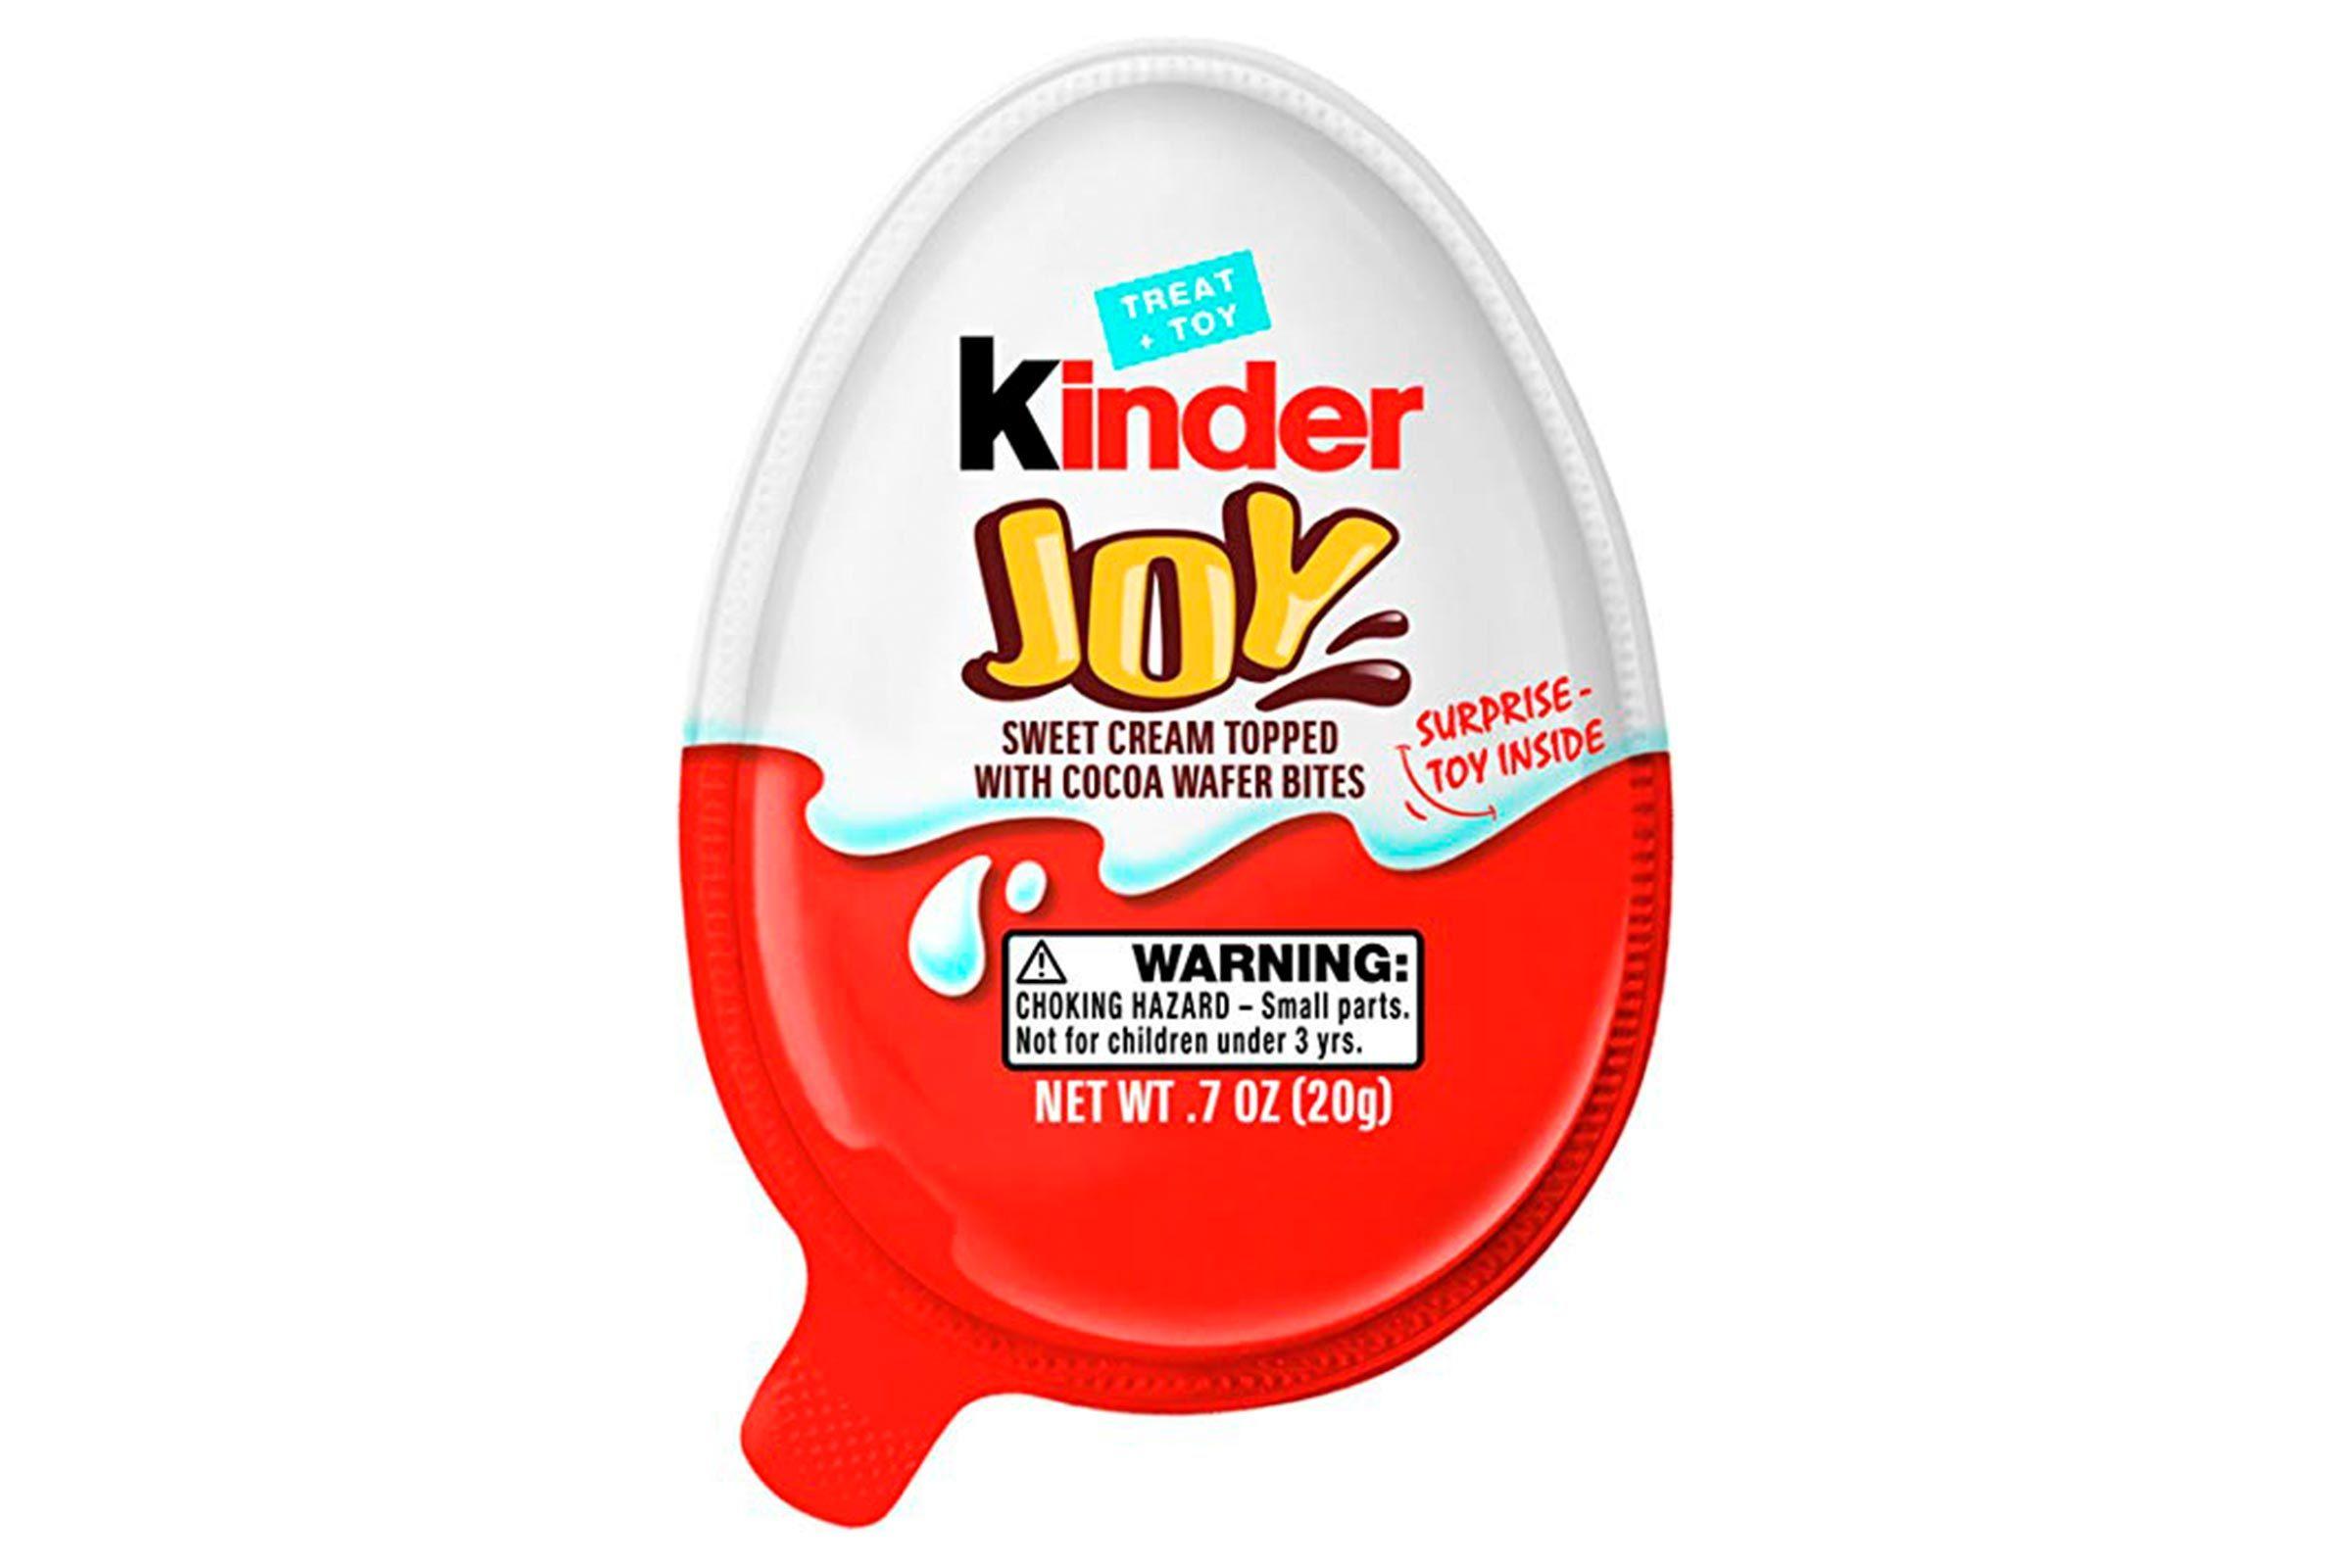 Kinder Joy Chocolate Treats